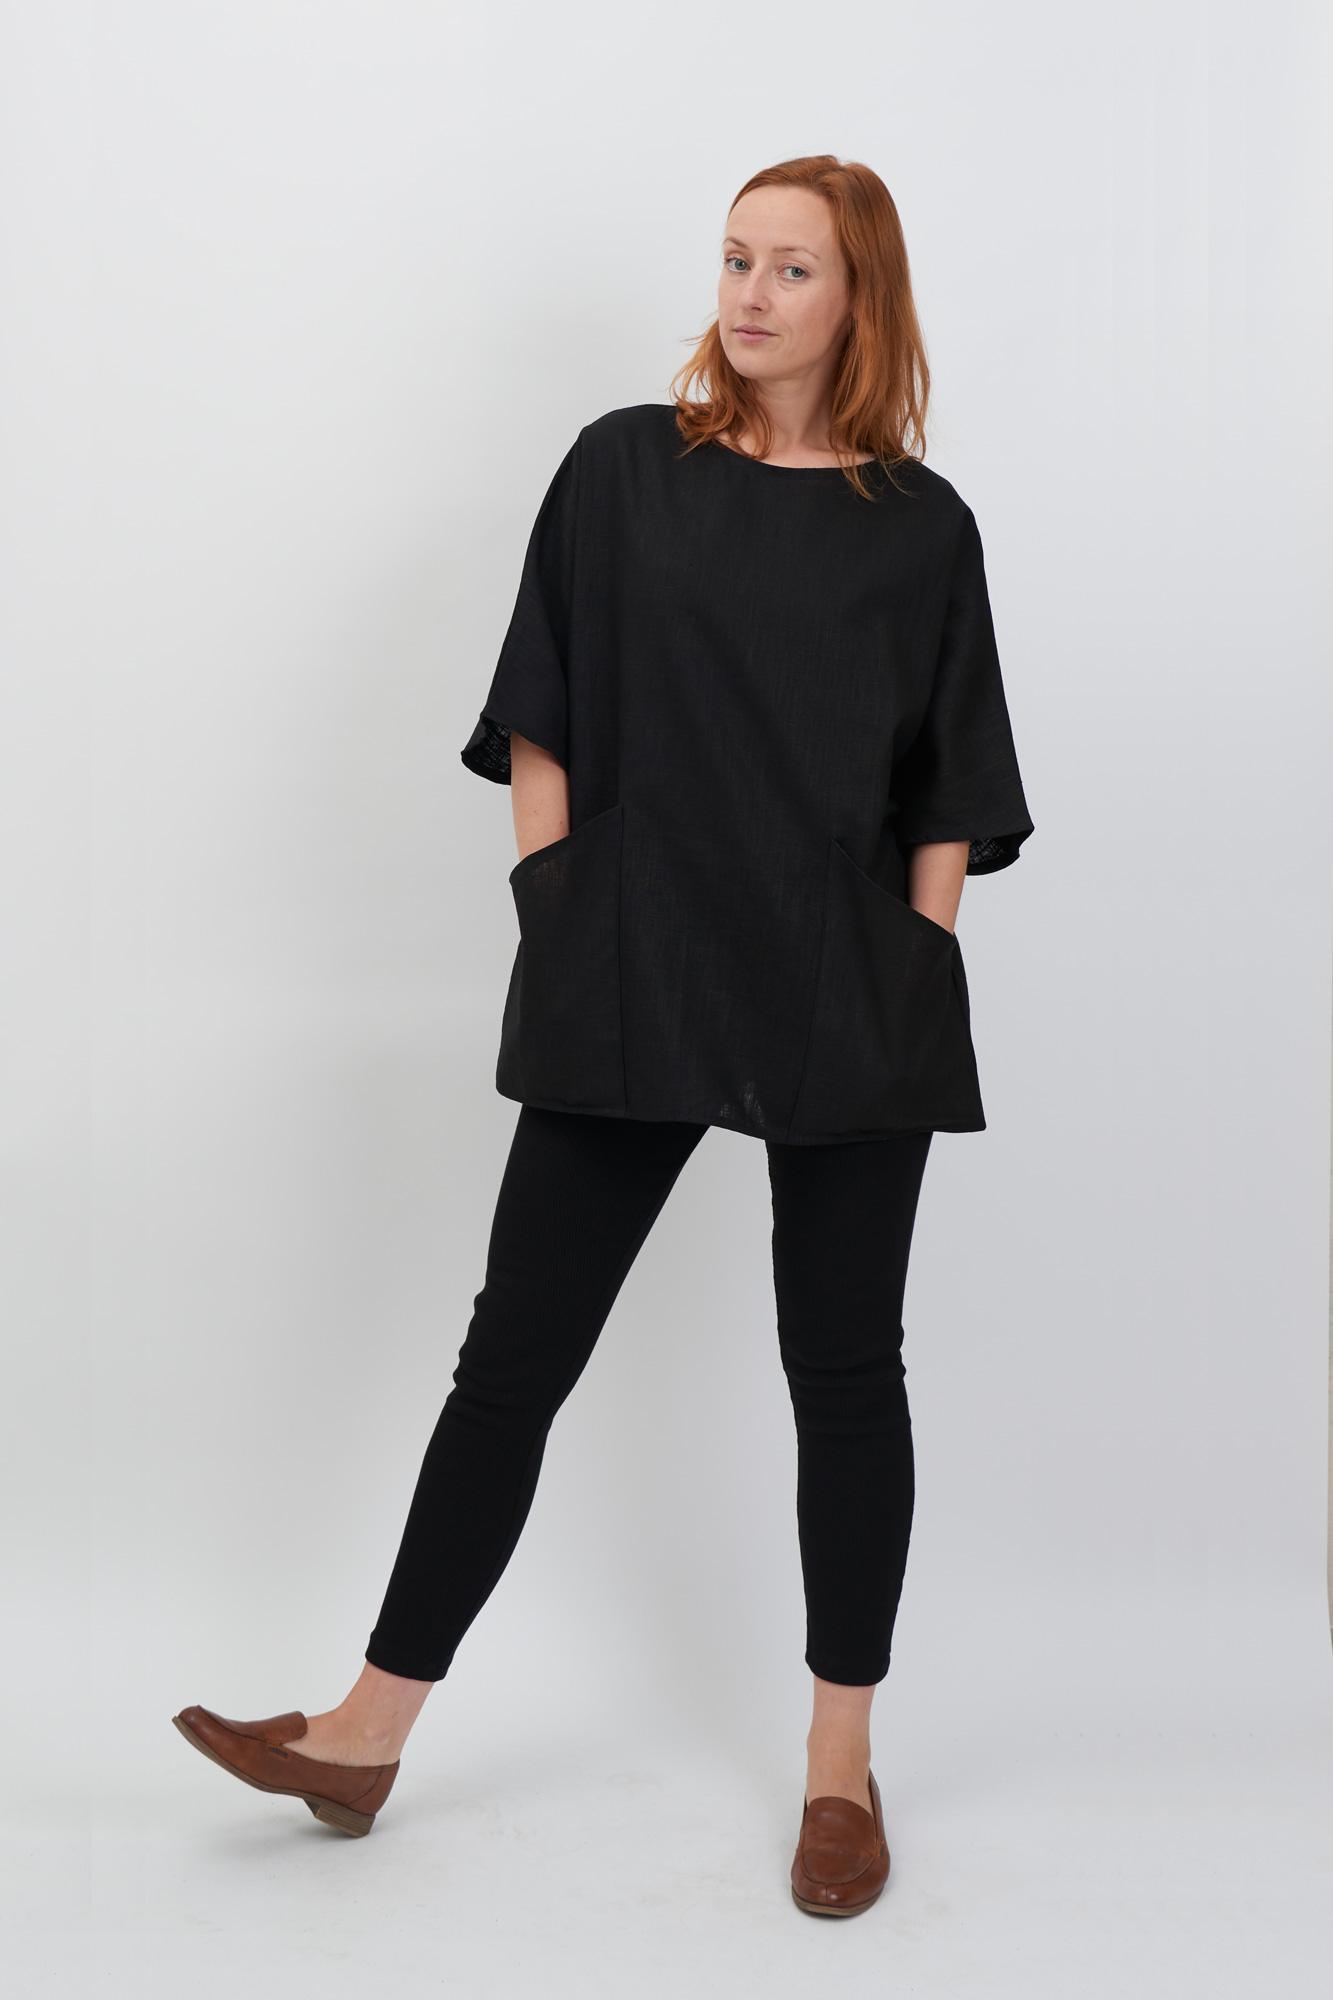 tunic-black-front.jpg